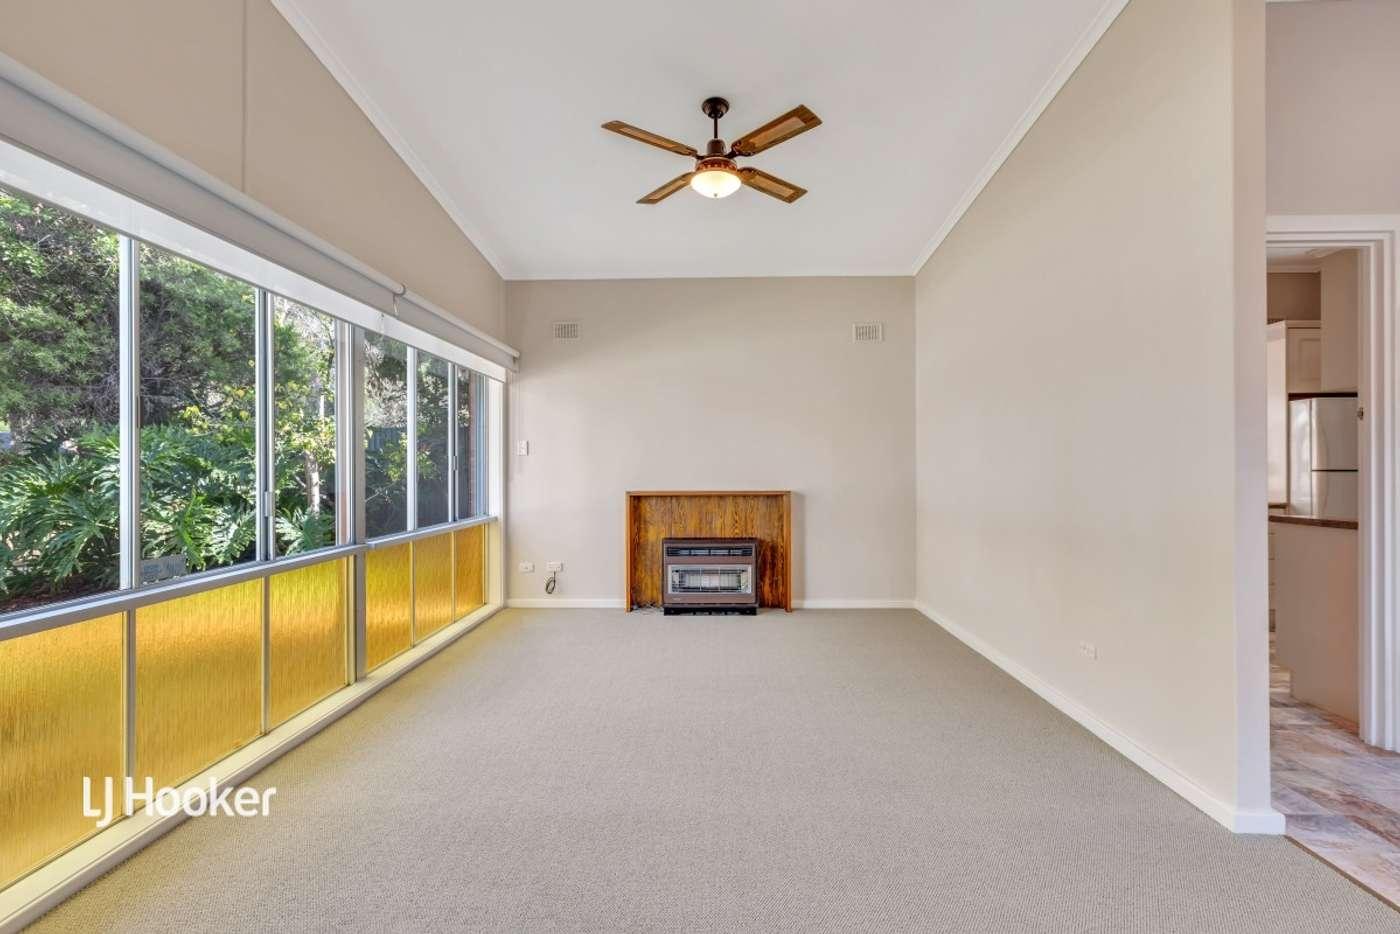 Fifth view of Homely house listing, 277 Waterloo Corner Road, Salisbury North SA 5108